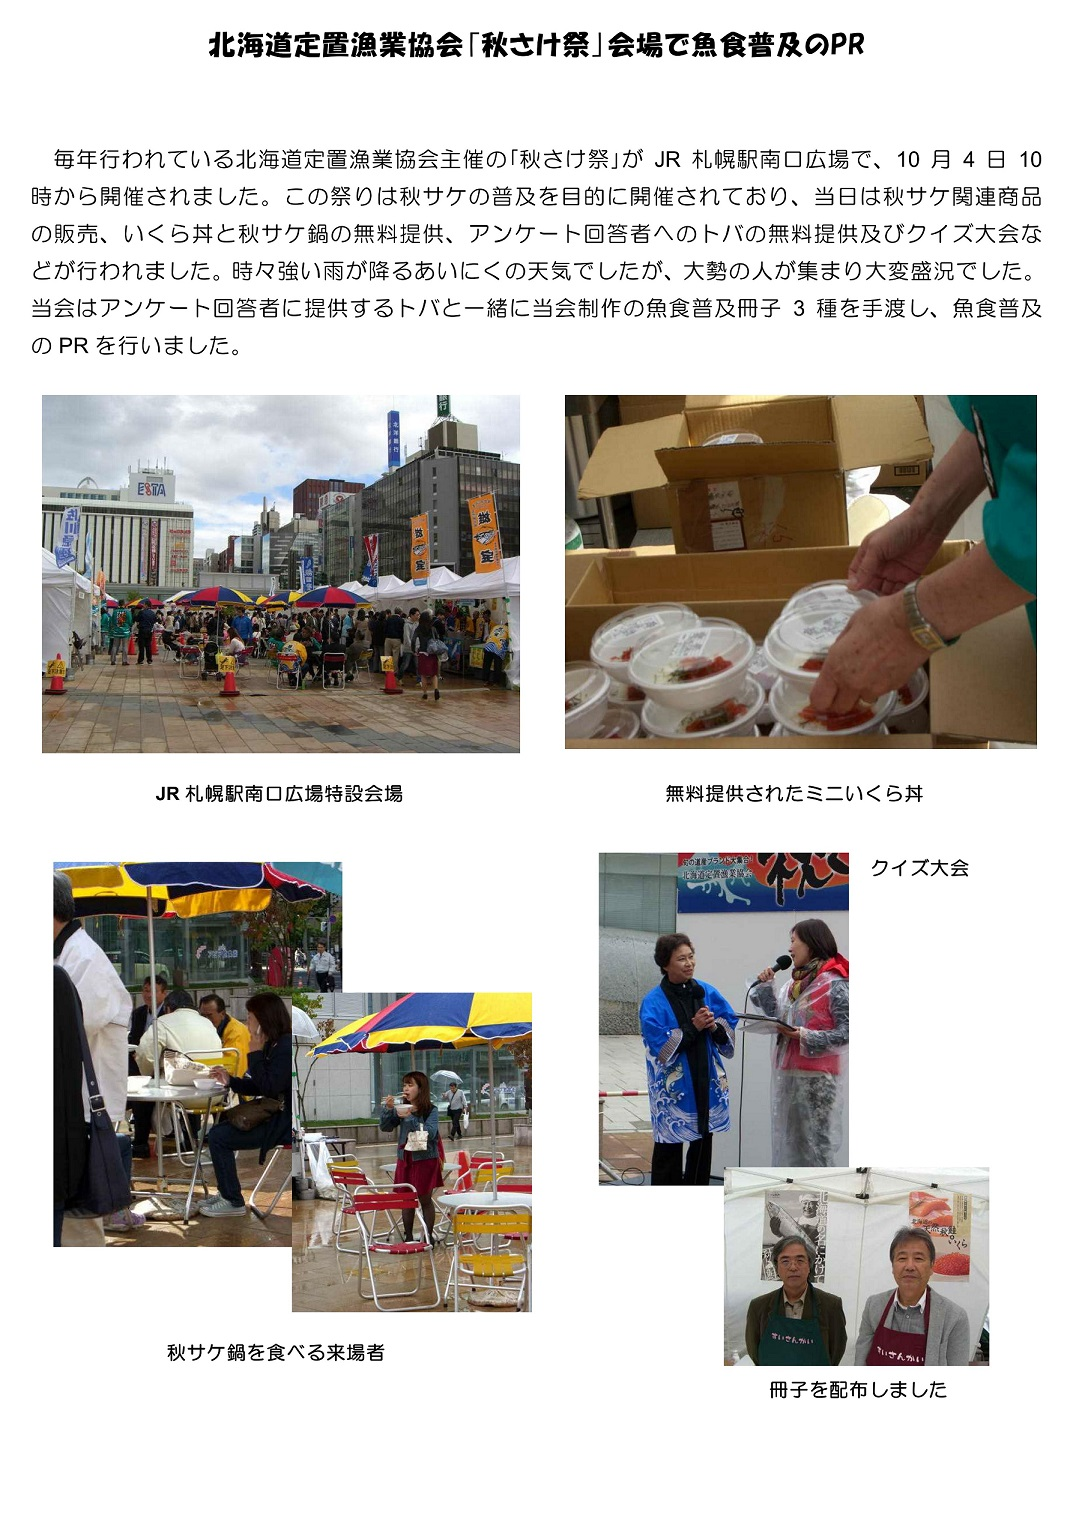 H26HP原稿(秋サケ祭)